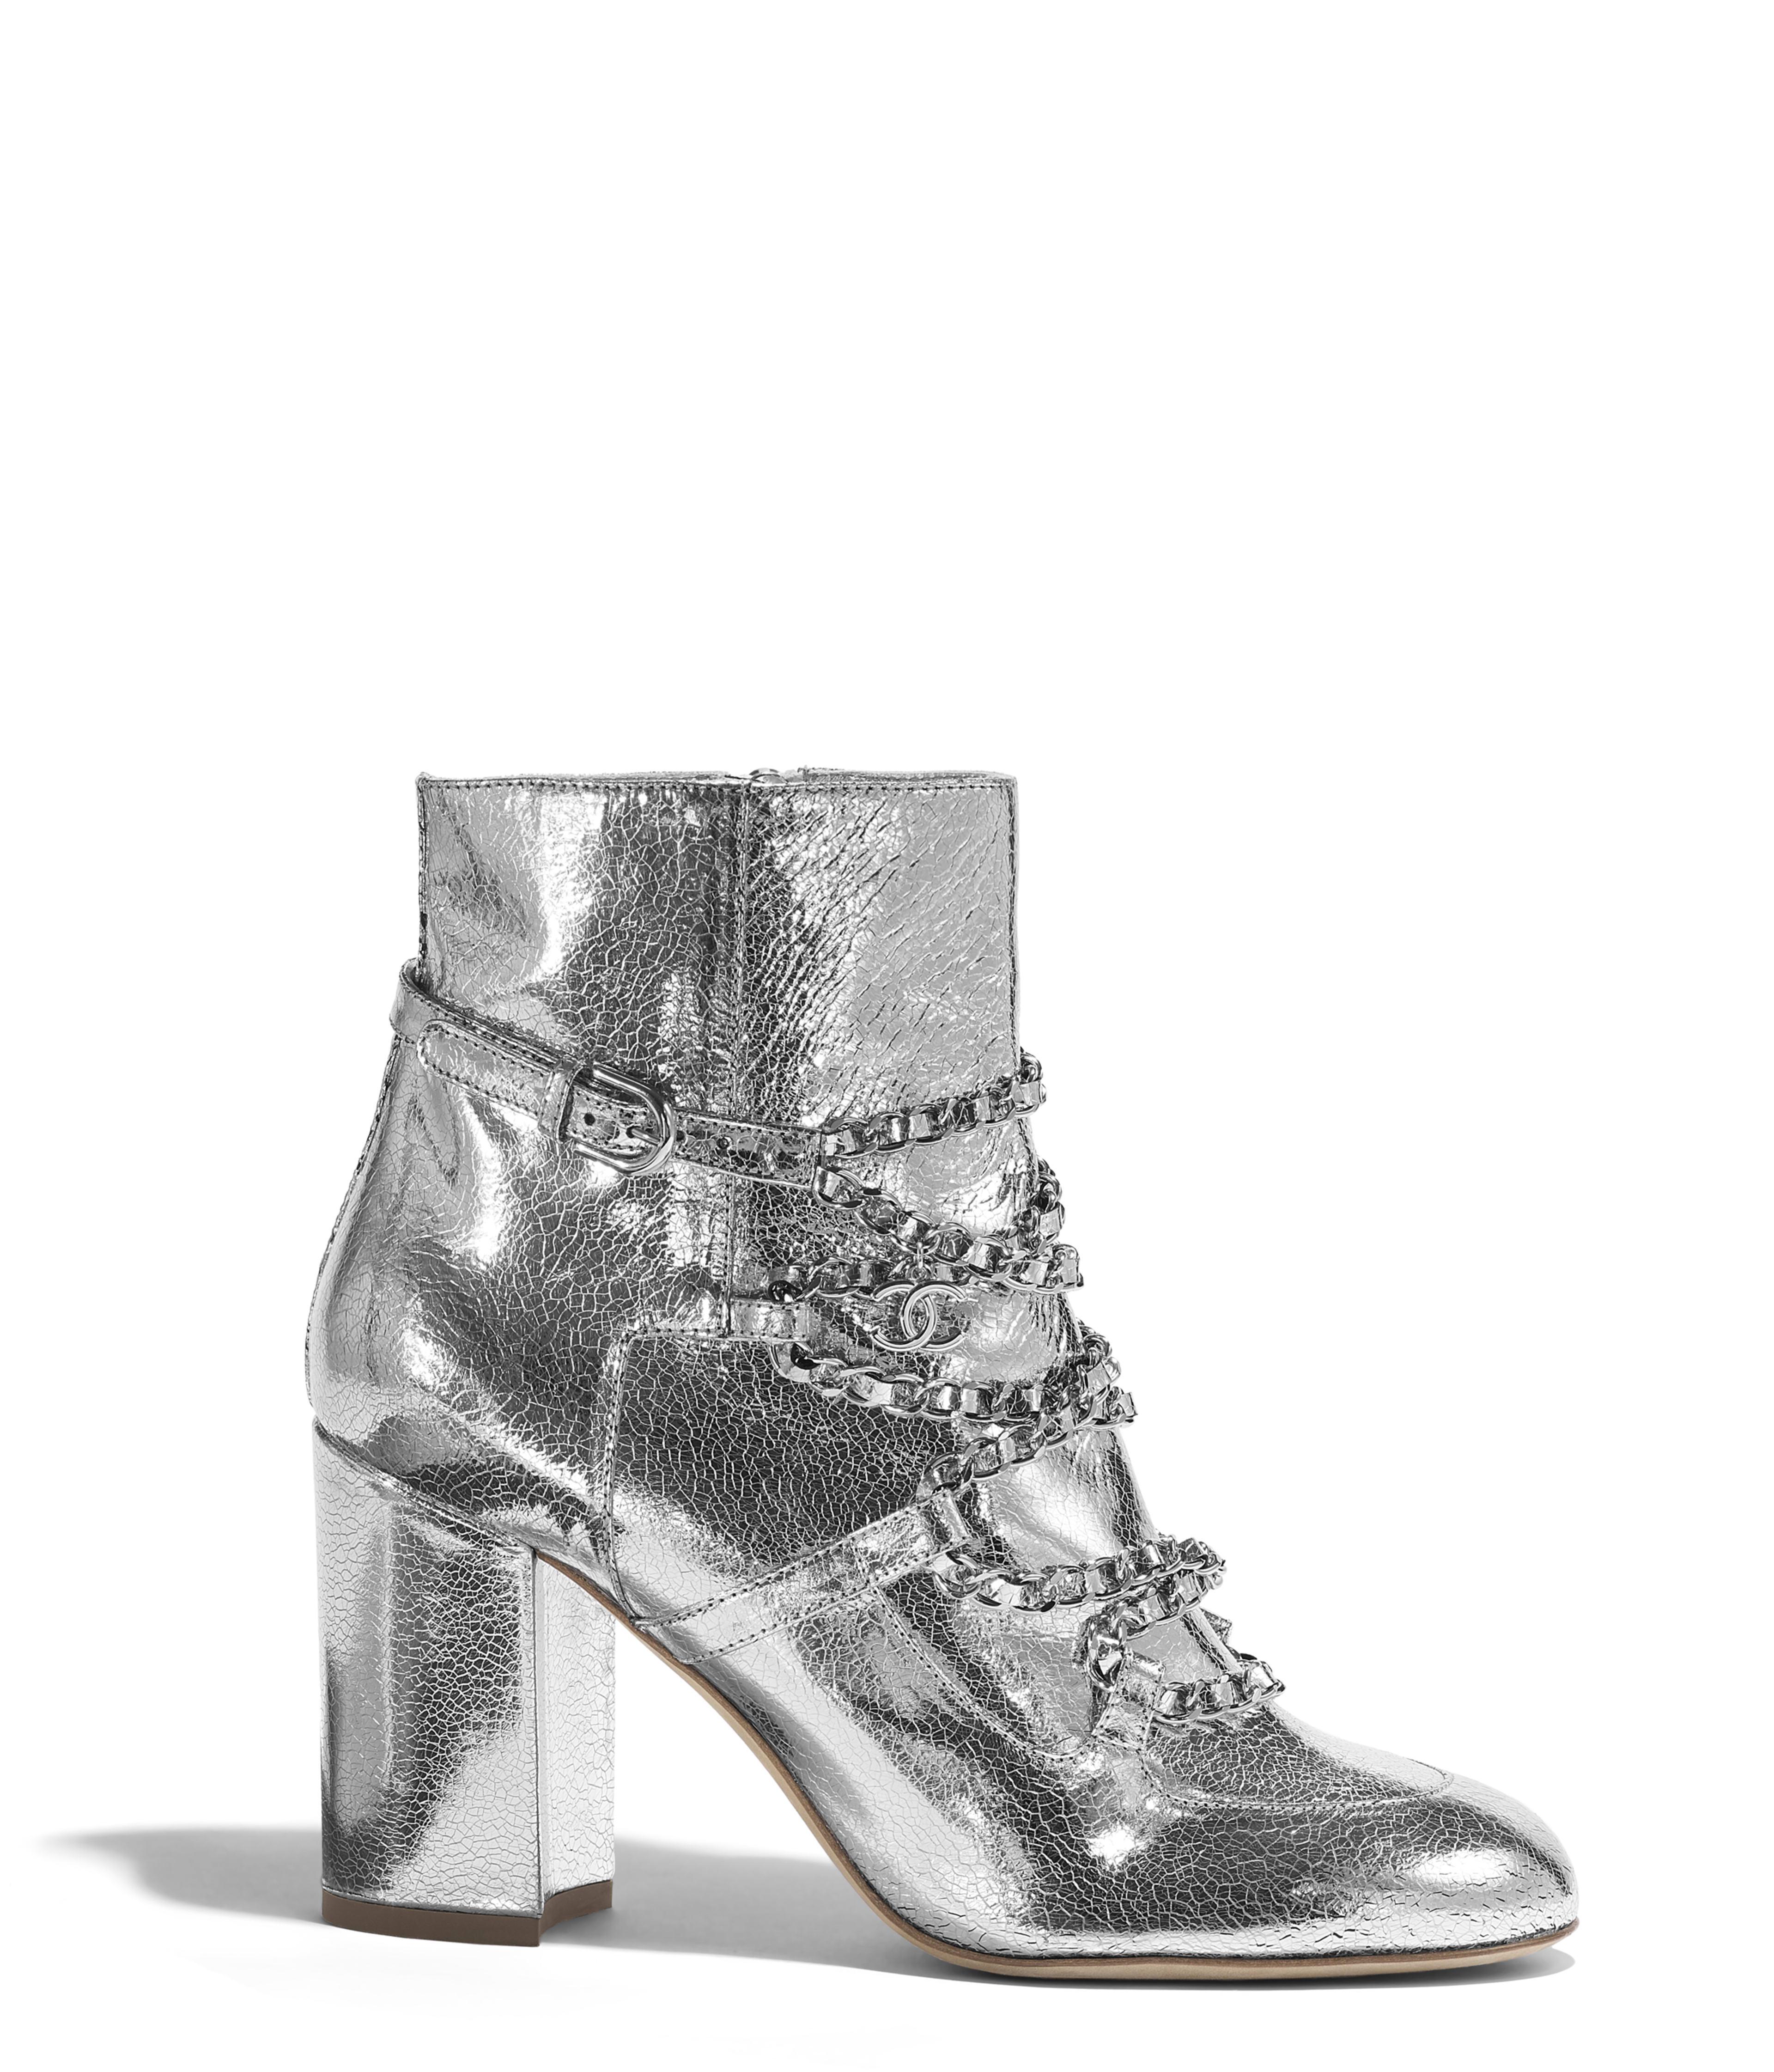 8a694fc88c3e41 Short Boots Laminated Goatskin, Silver Ref. G34489X529670H559